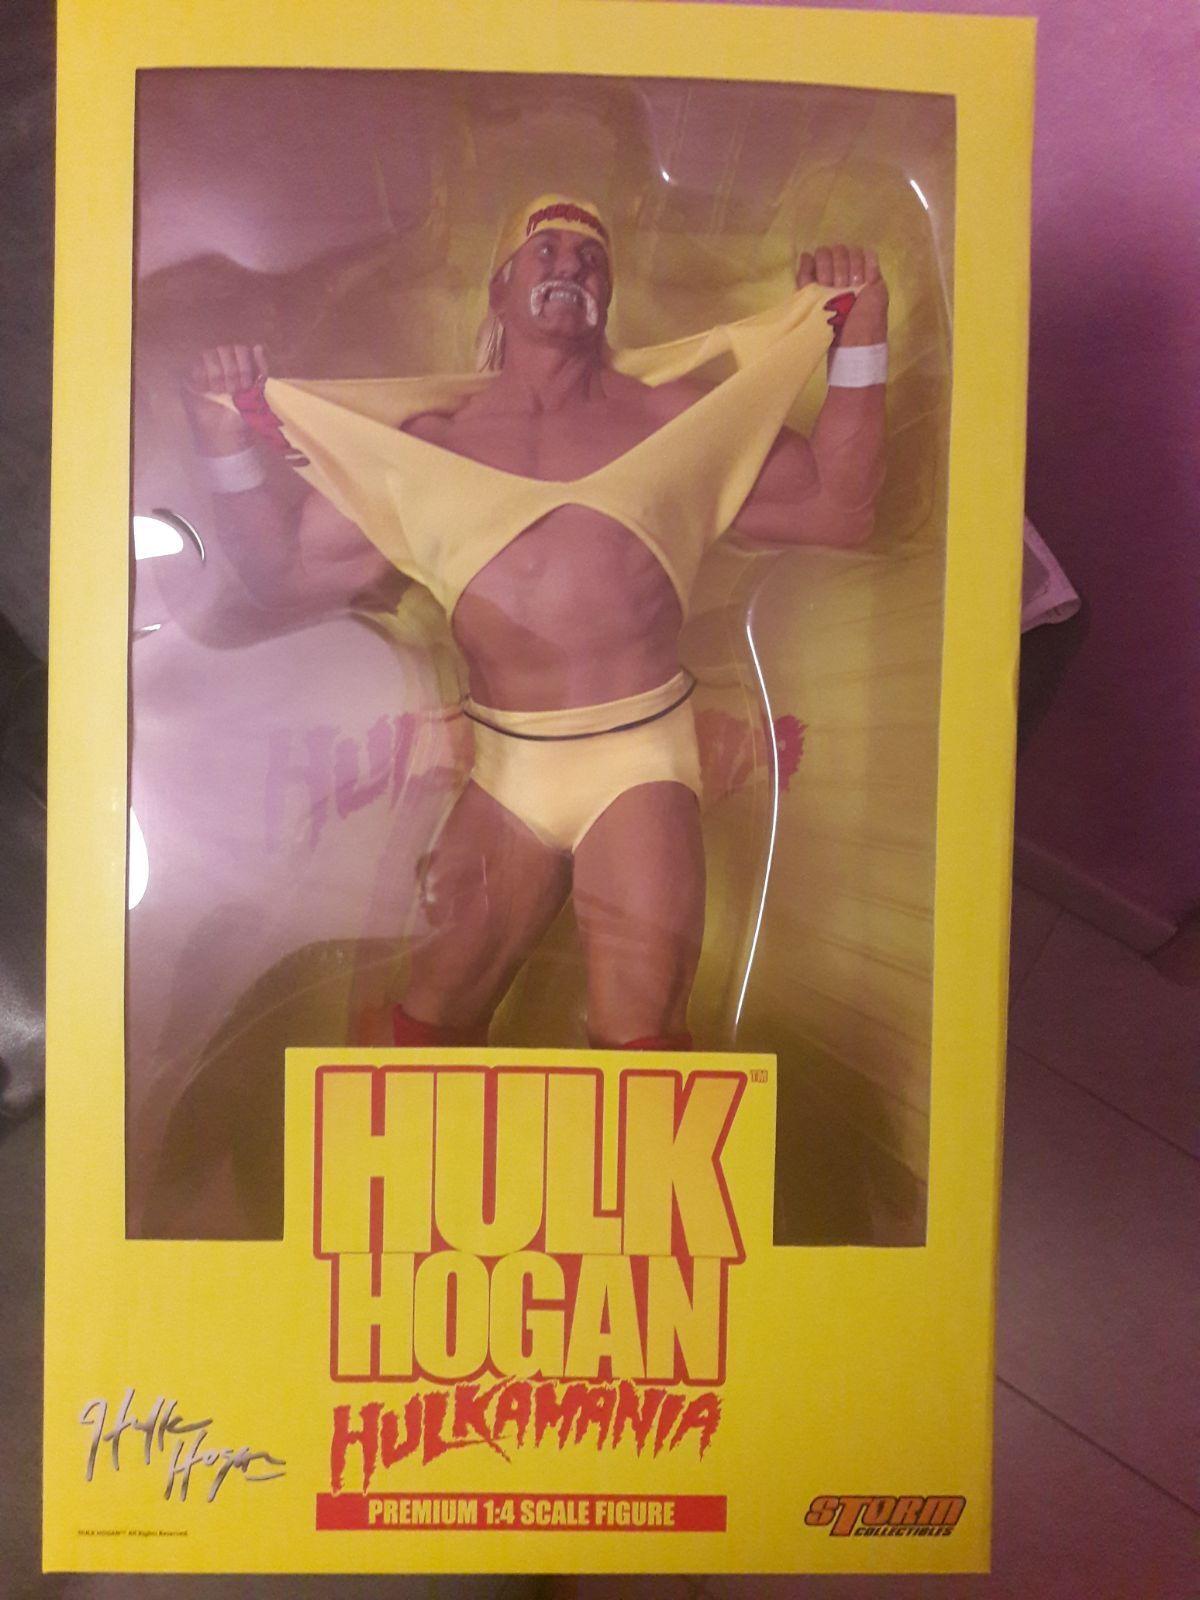 Storm Collectibles HULK HOGAN Hulkamania Premium 1:4 Scale Figure WRESTLING 48cm